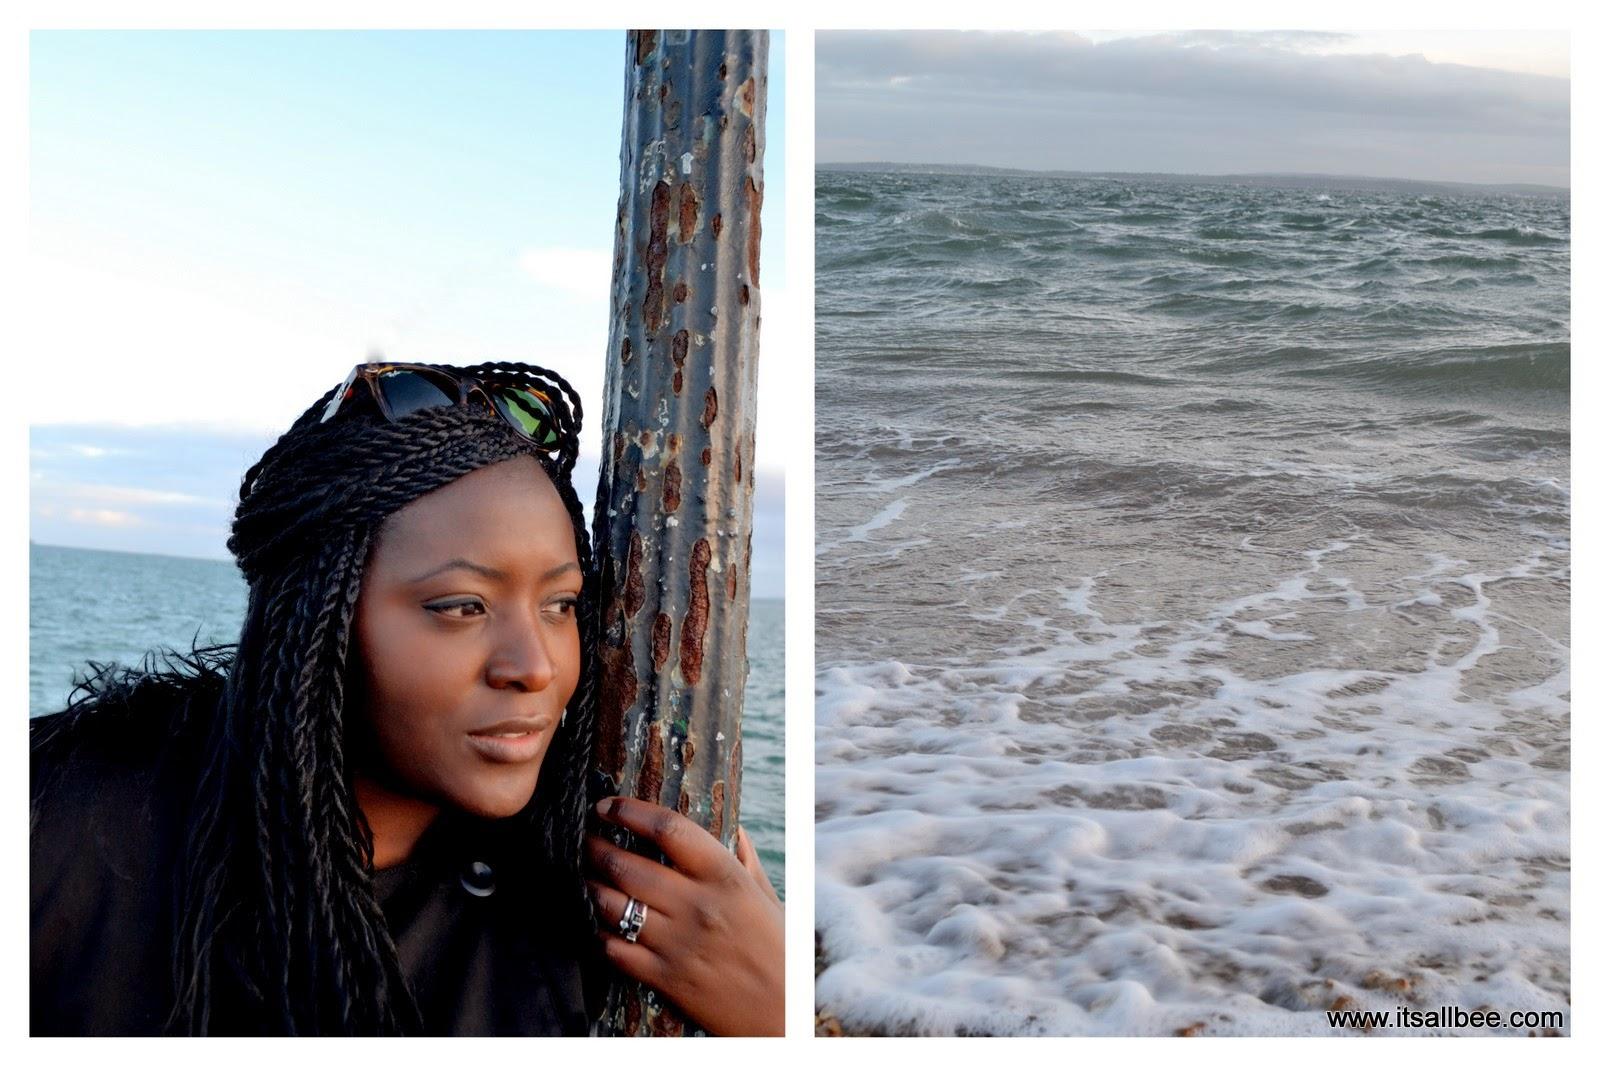 Portsea Island - southsea beach